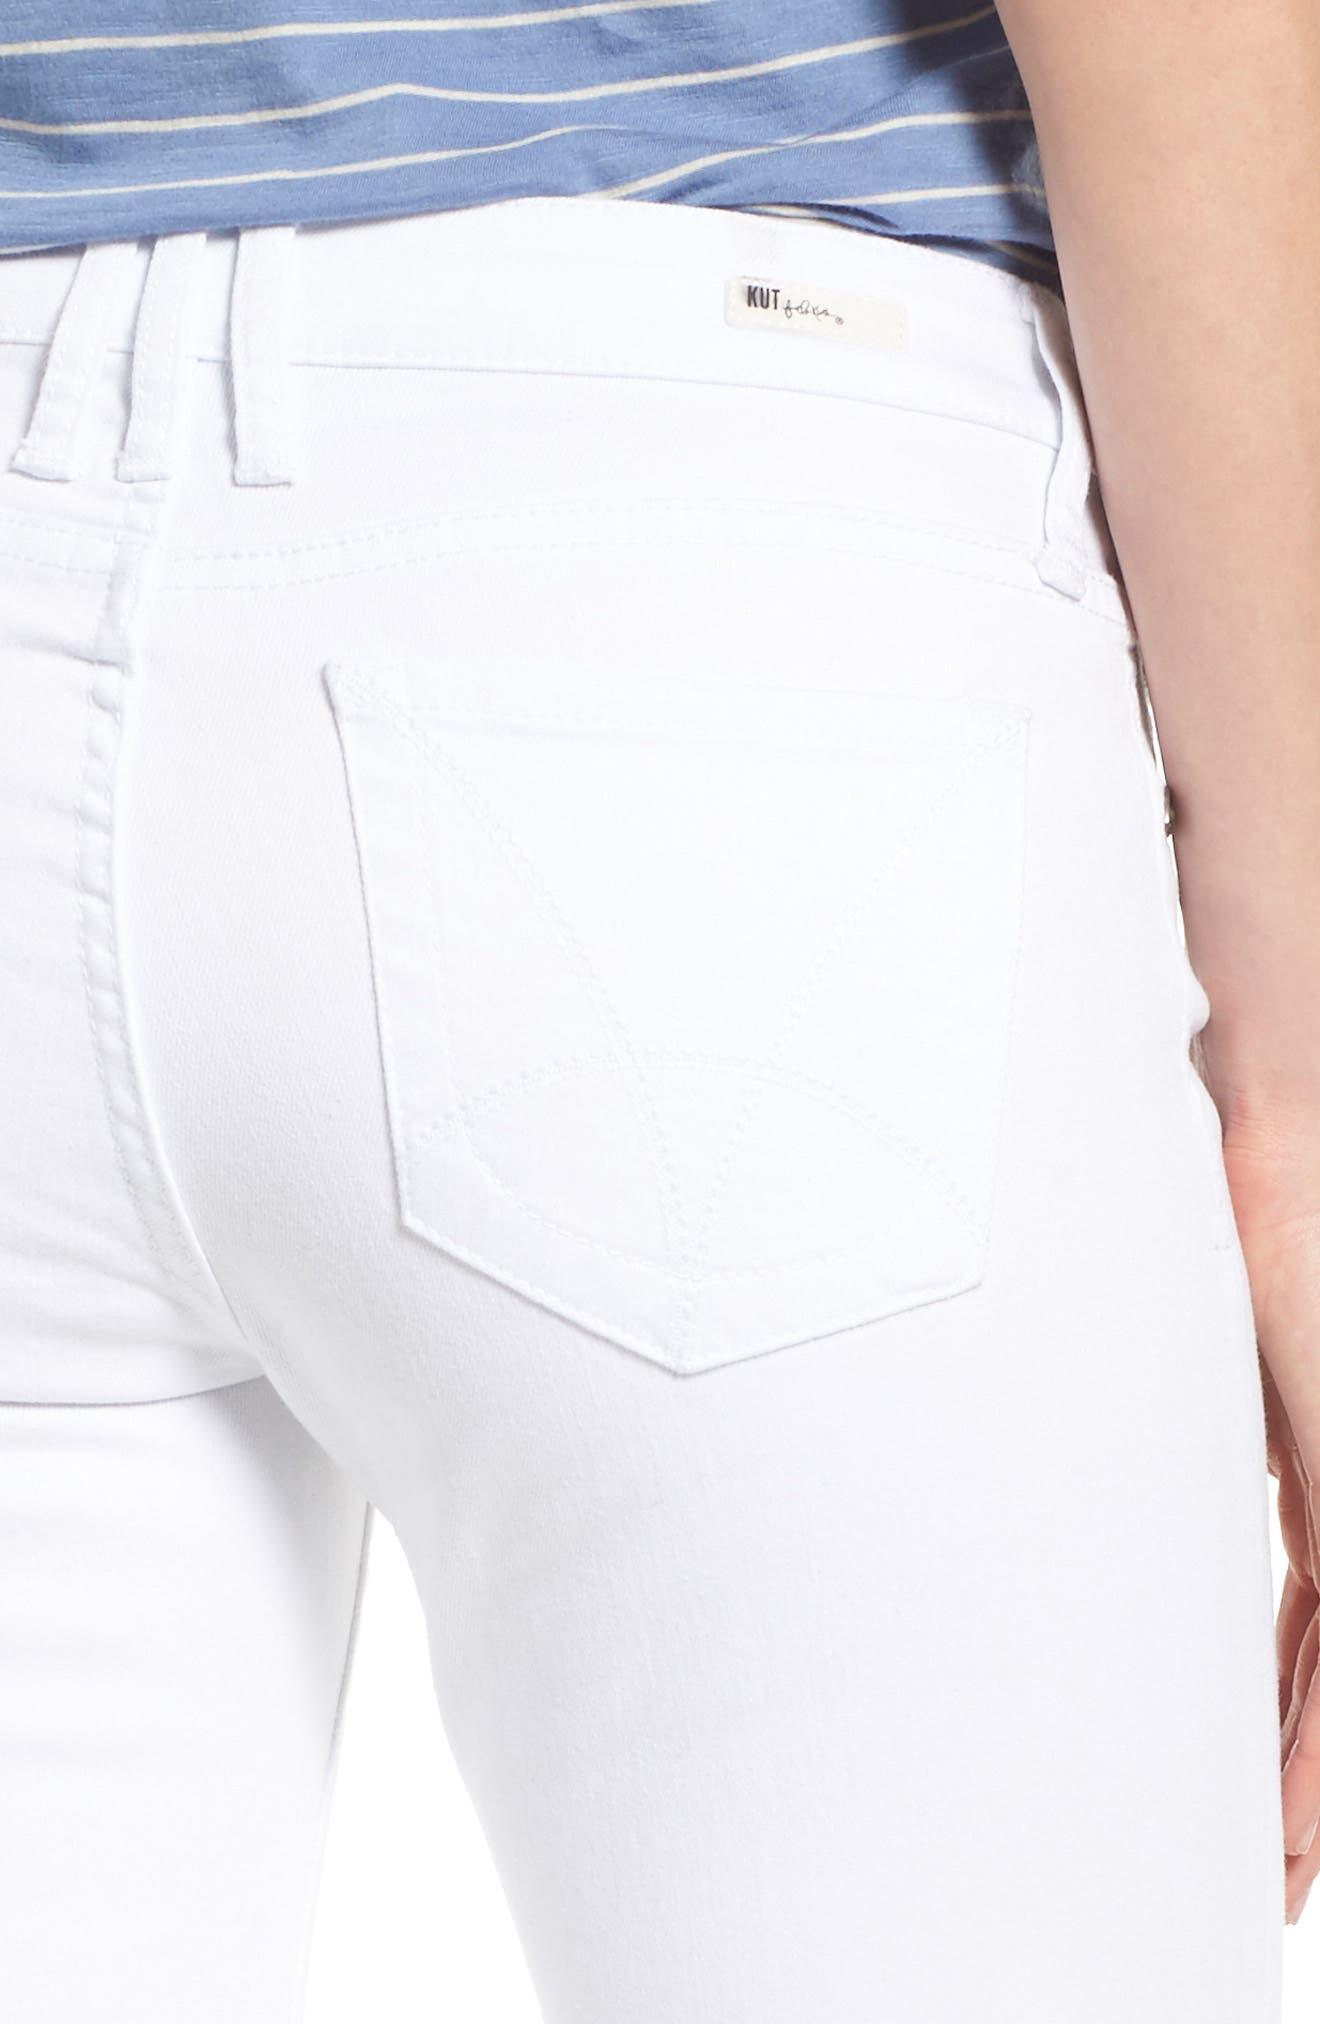 Catherine Stretch Boyfriend Jeans,                             Alternate thumbnail 5, color,                             White